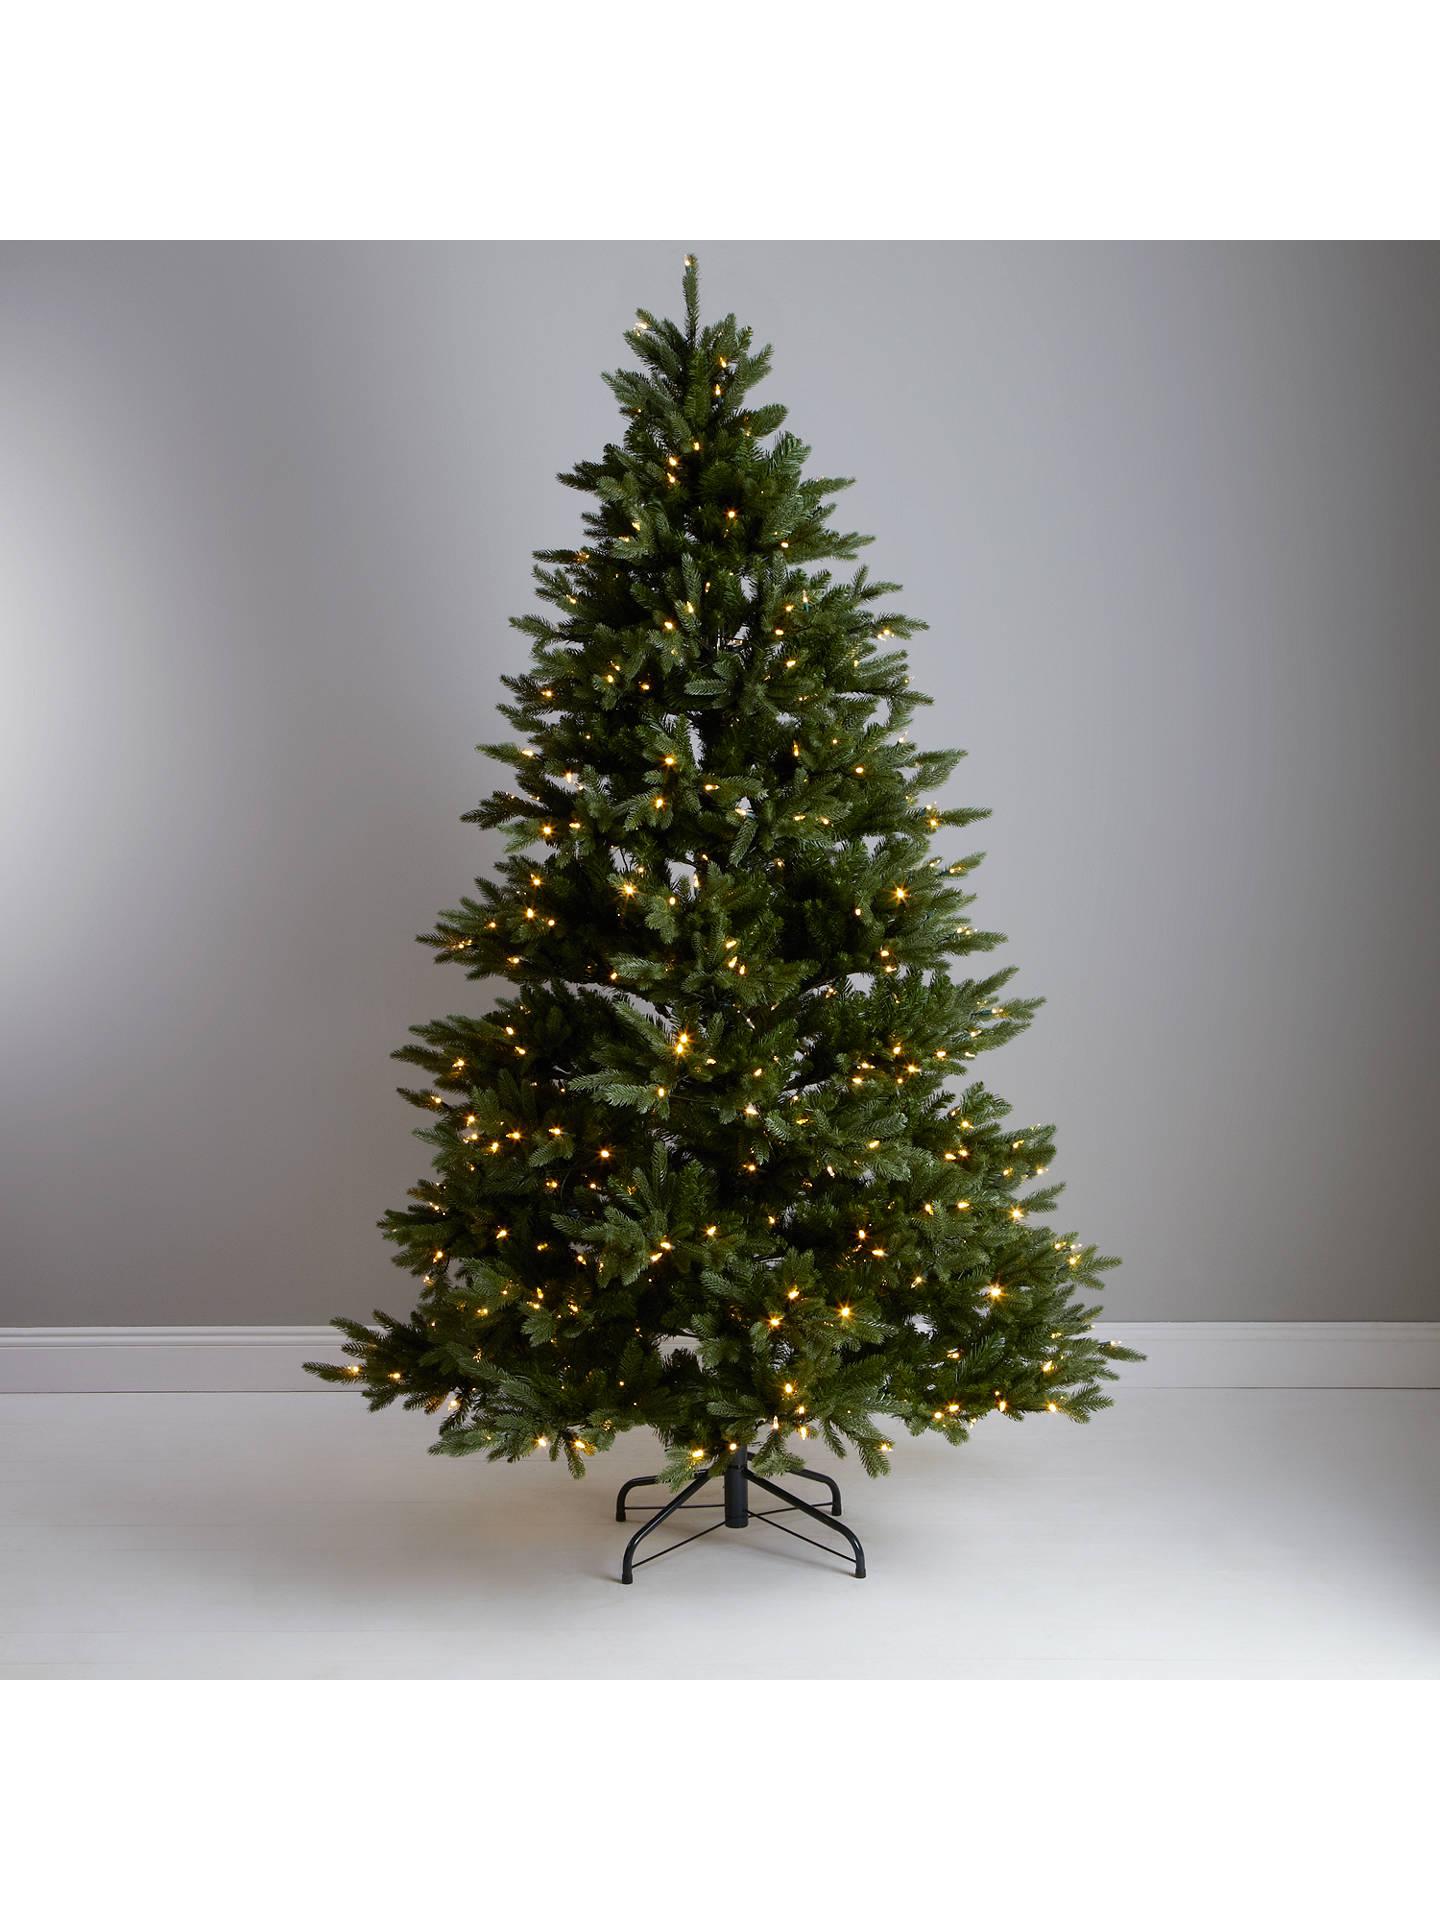 john lewis prelit dual light christmas tree green 75ft at john